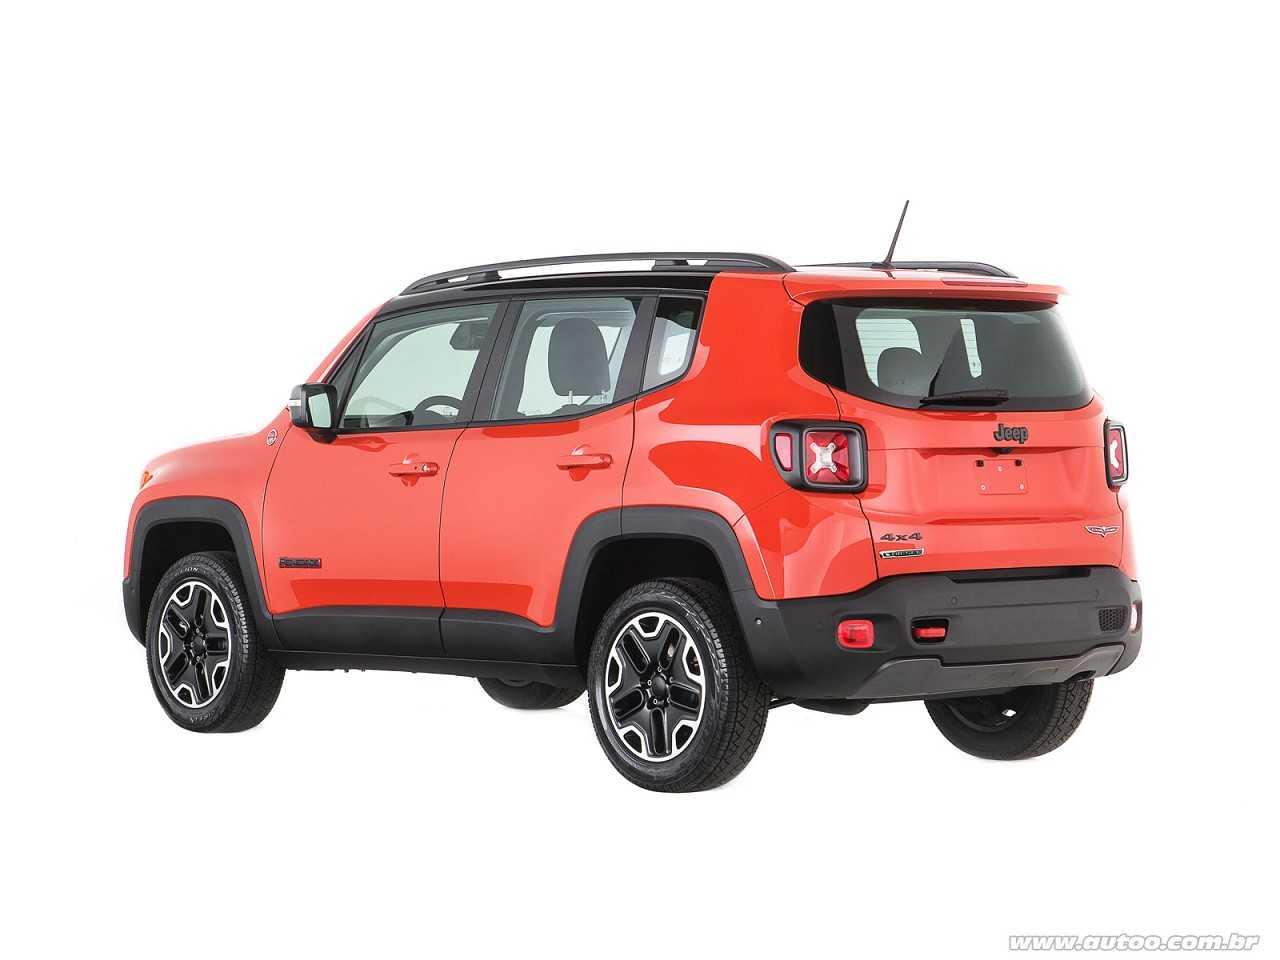 JeepRenegade 2015 - ângulo traseiro